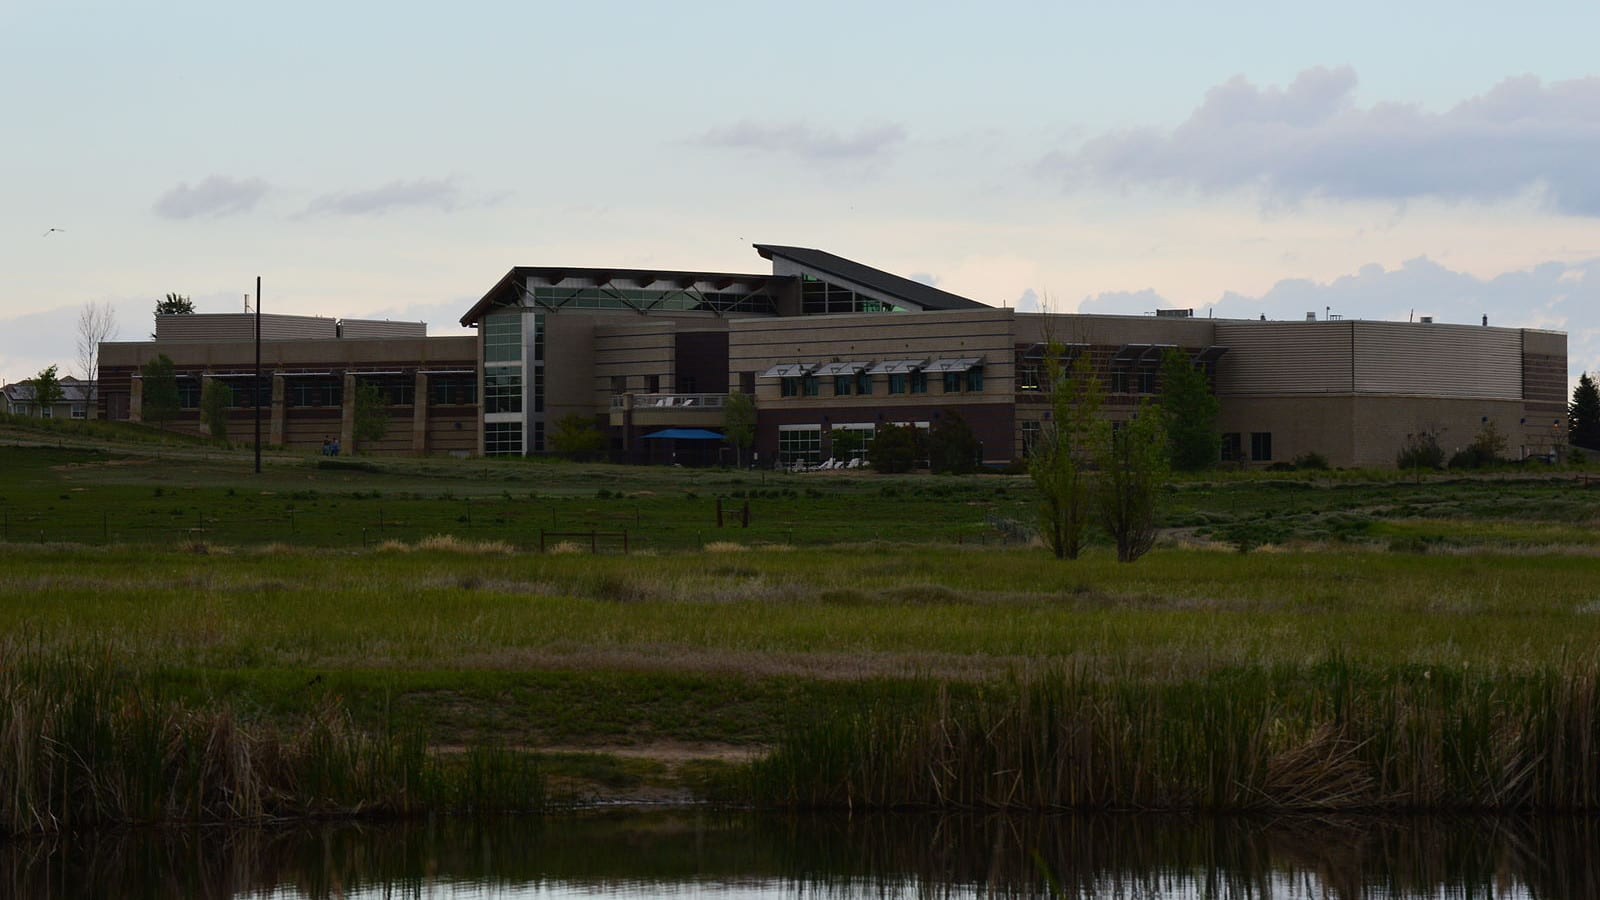 Broomfield Colorado Paul Derda Recreation Center